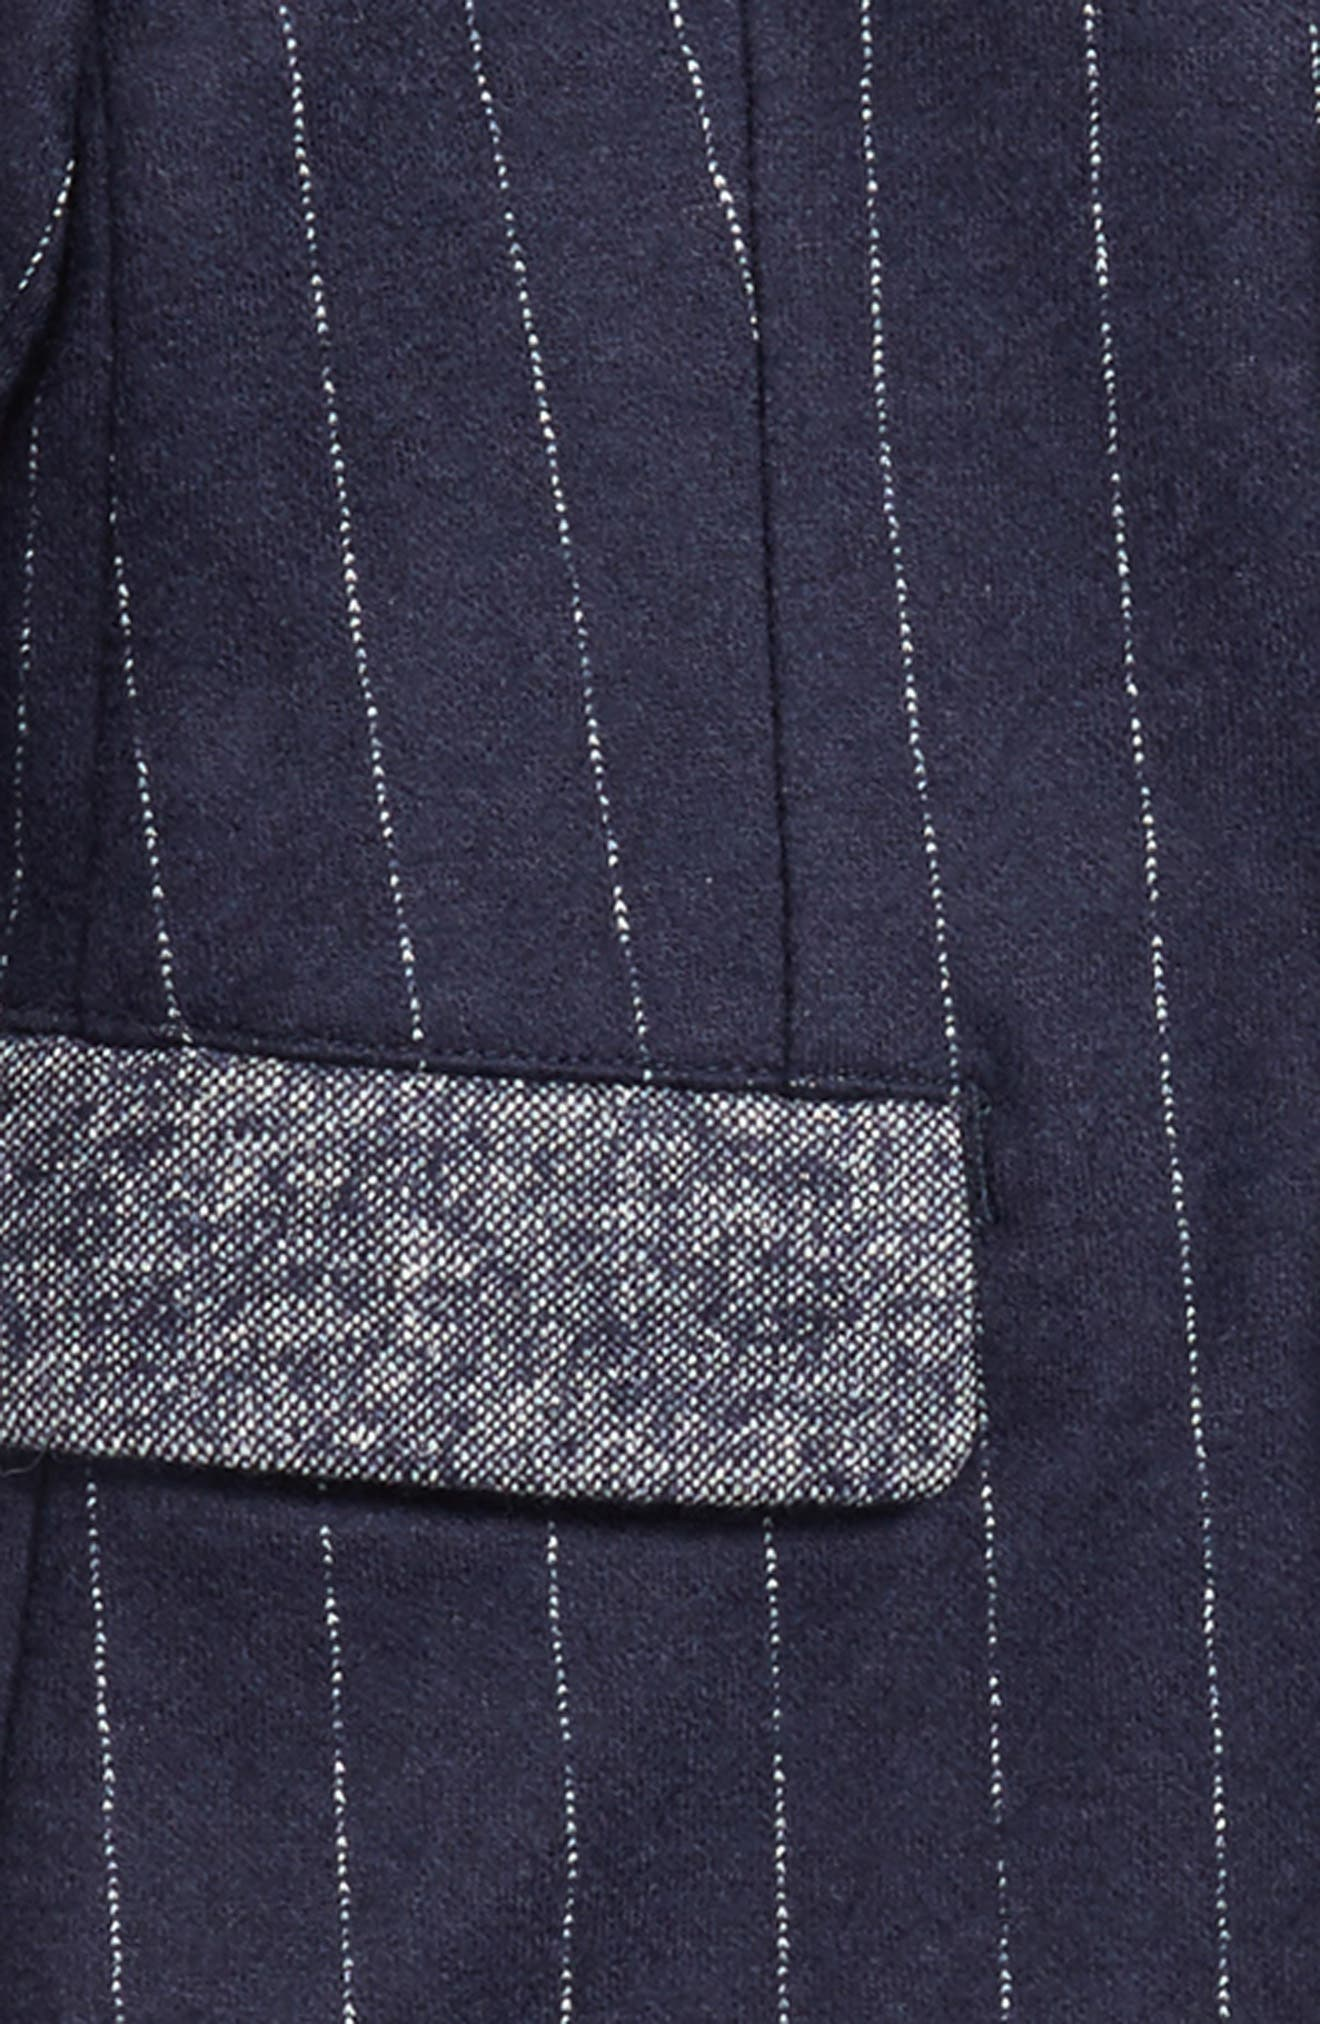 Pinstripe Blazer,                             Alternate thumbnail 2, color,                             Blue